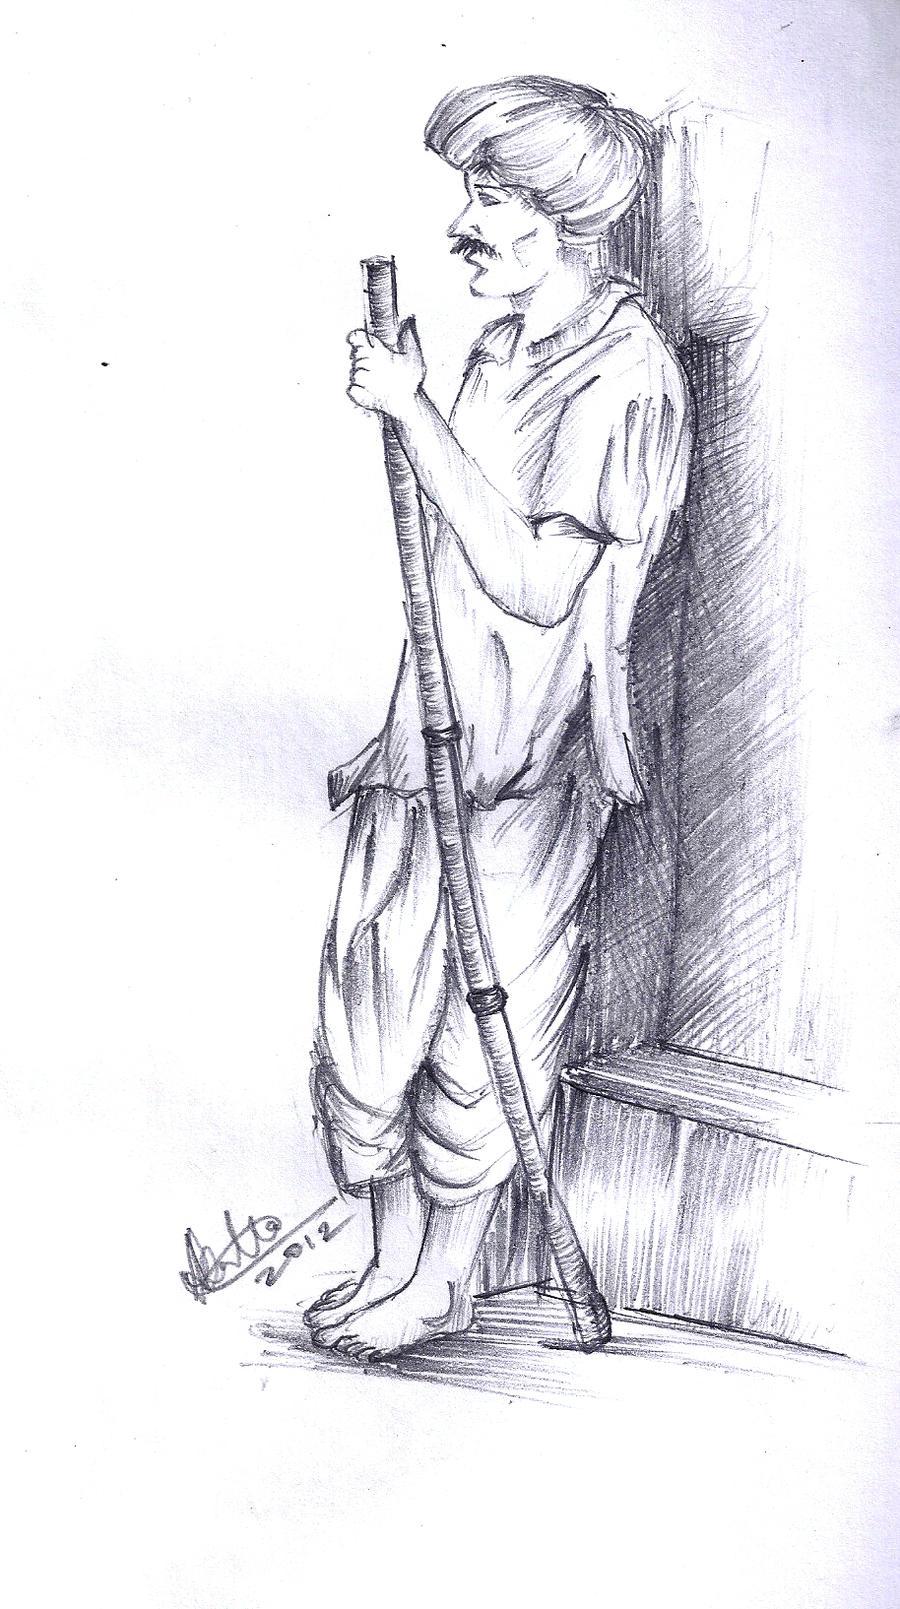 Simple Rajasthani Man Sketch By Alankrita-sweetstar On DeviantArt